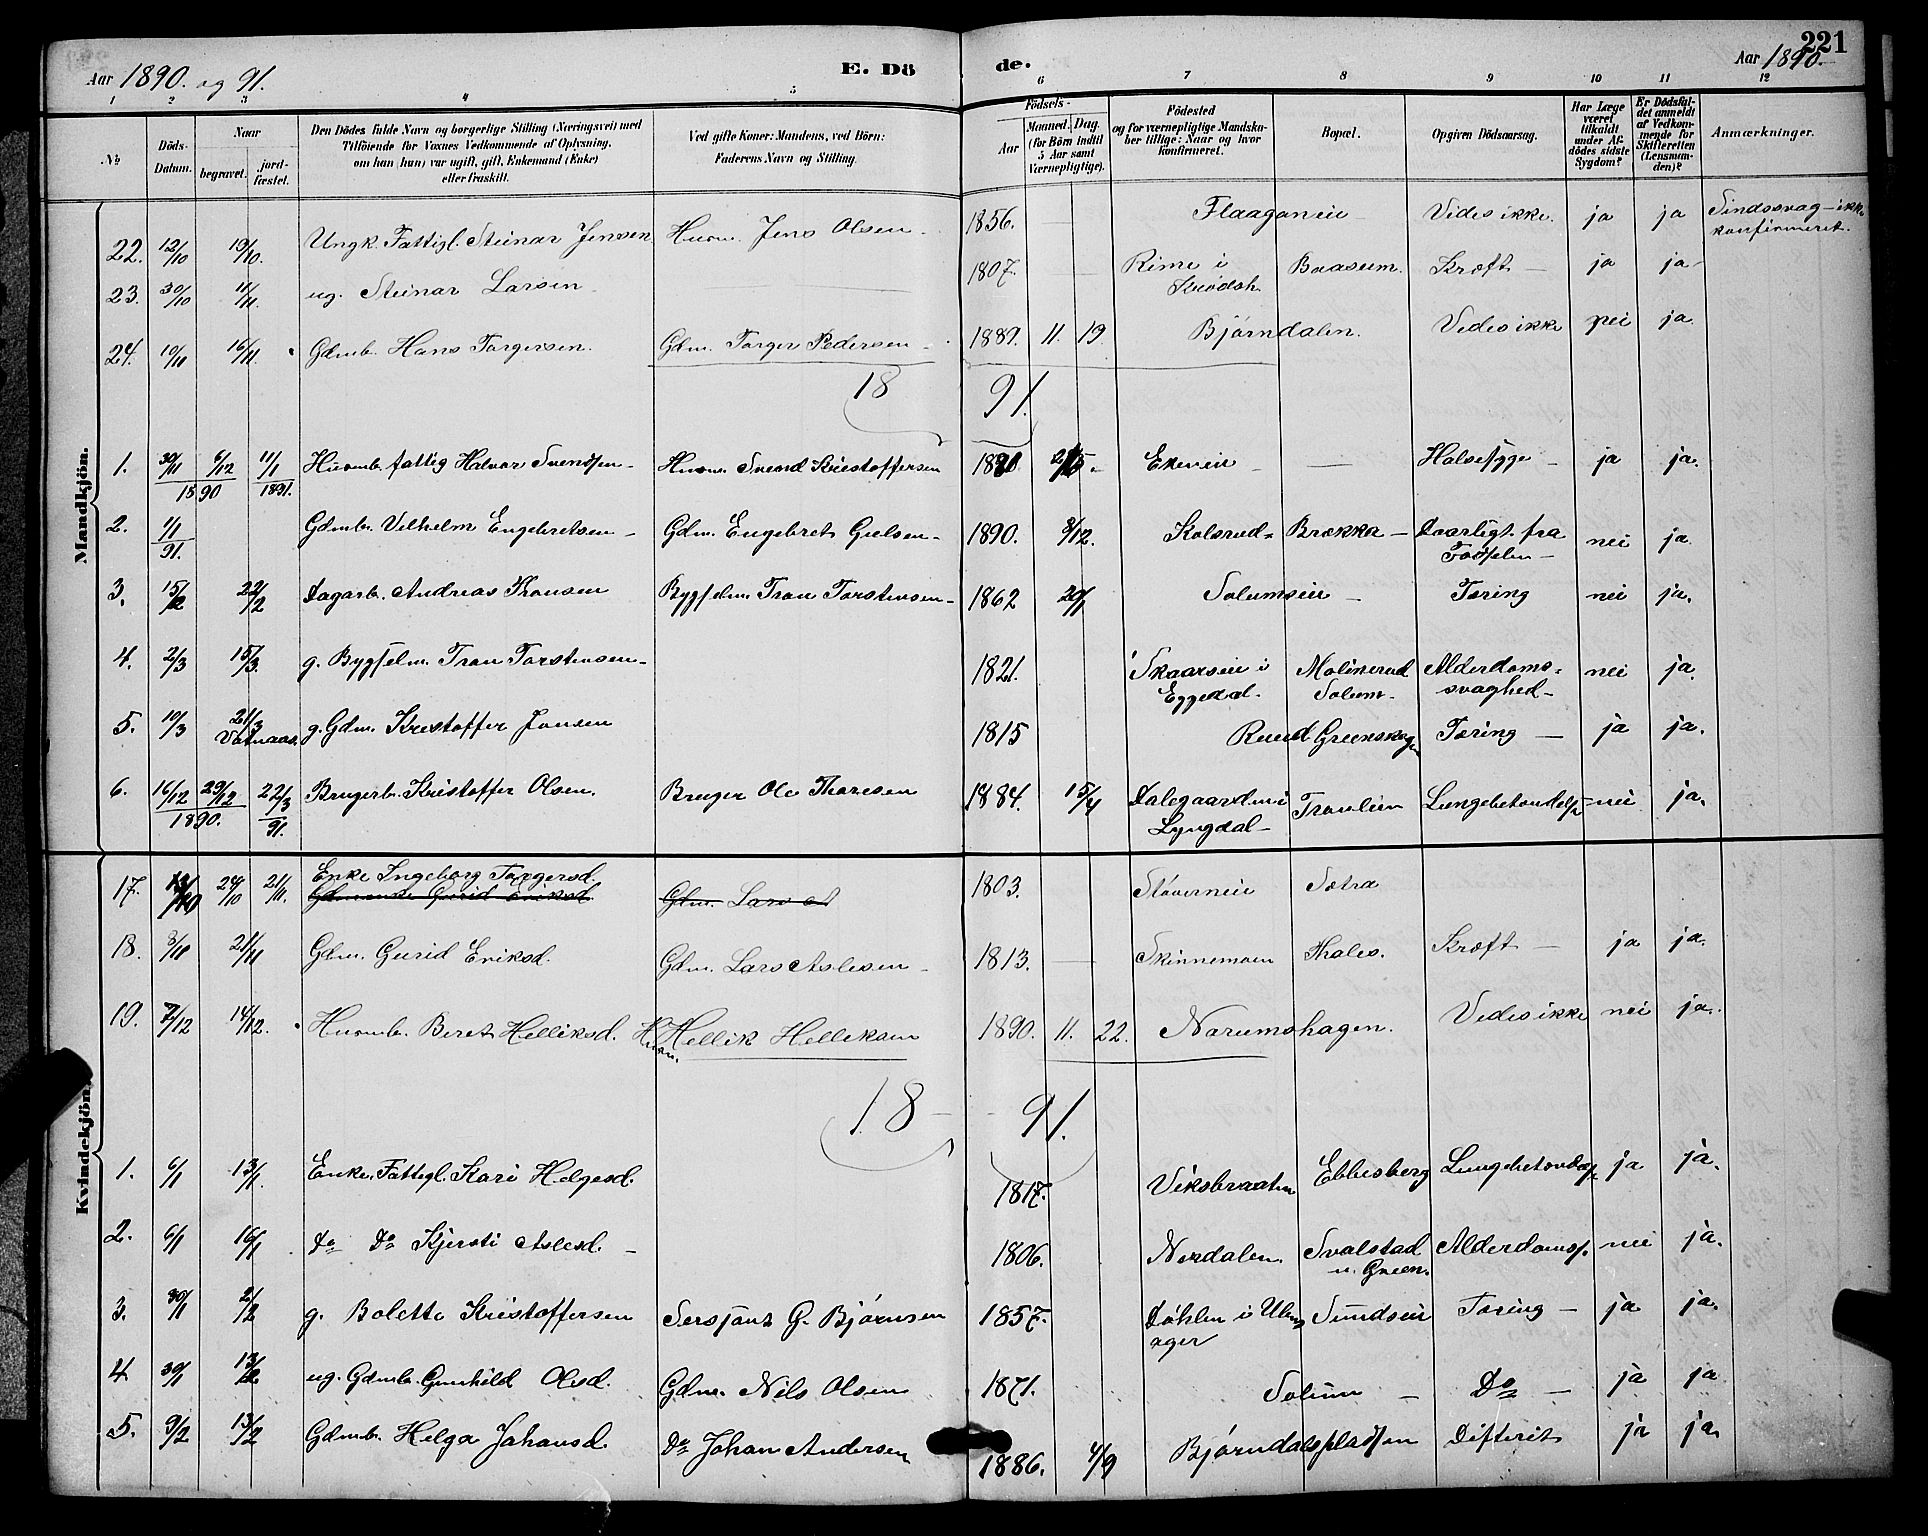 SAKO, Sigdal kirkebøker, G/Ga/L0005: Klokkerbok nr. I 5, 1886-1900, s. 221